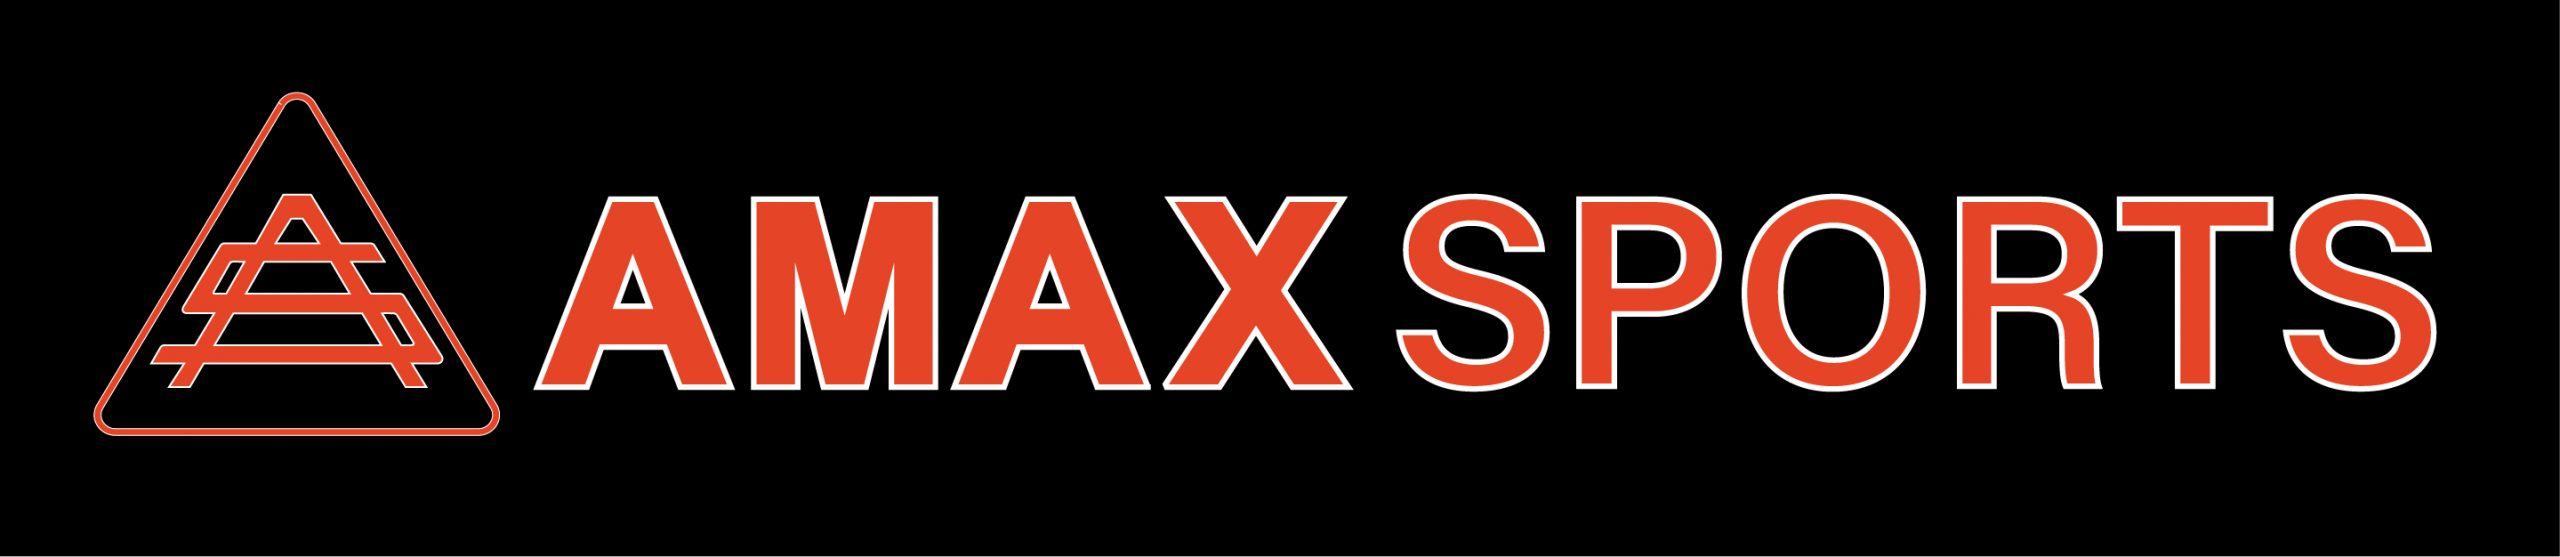 AMAX Sports - Hurling Equipment + Sportswear